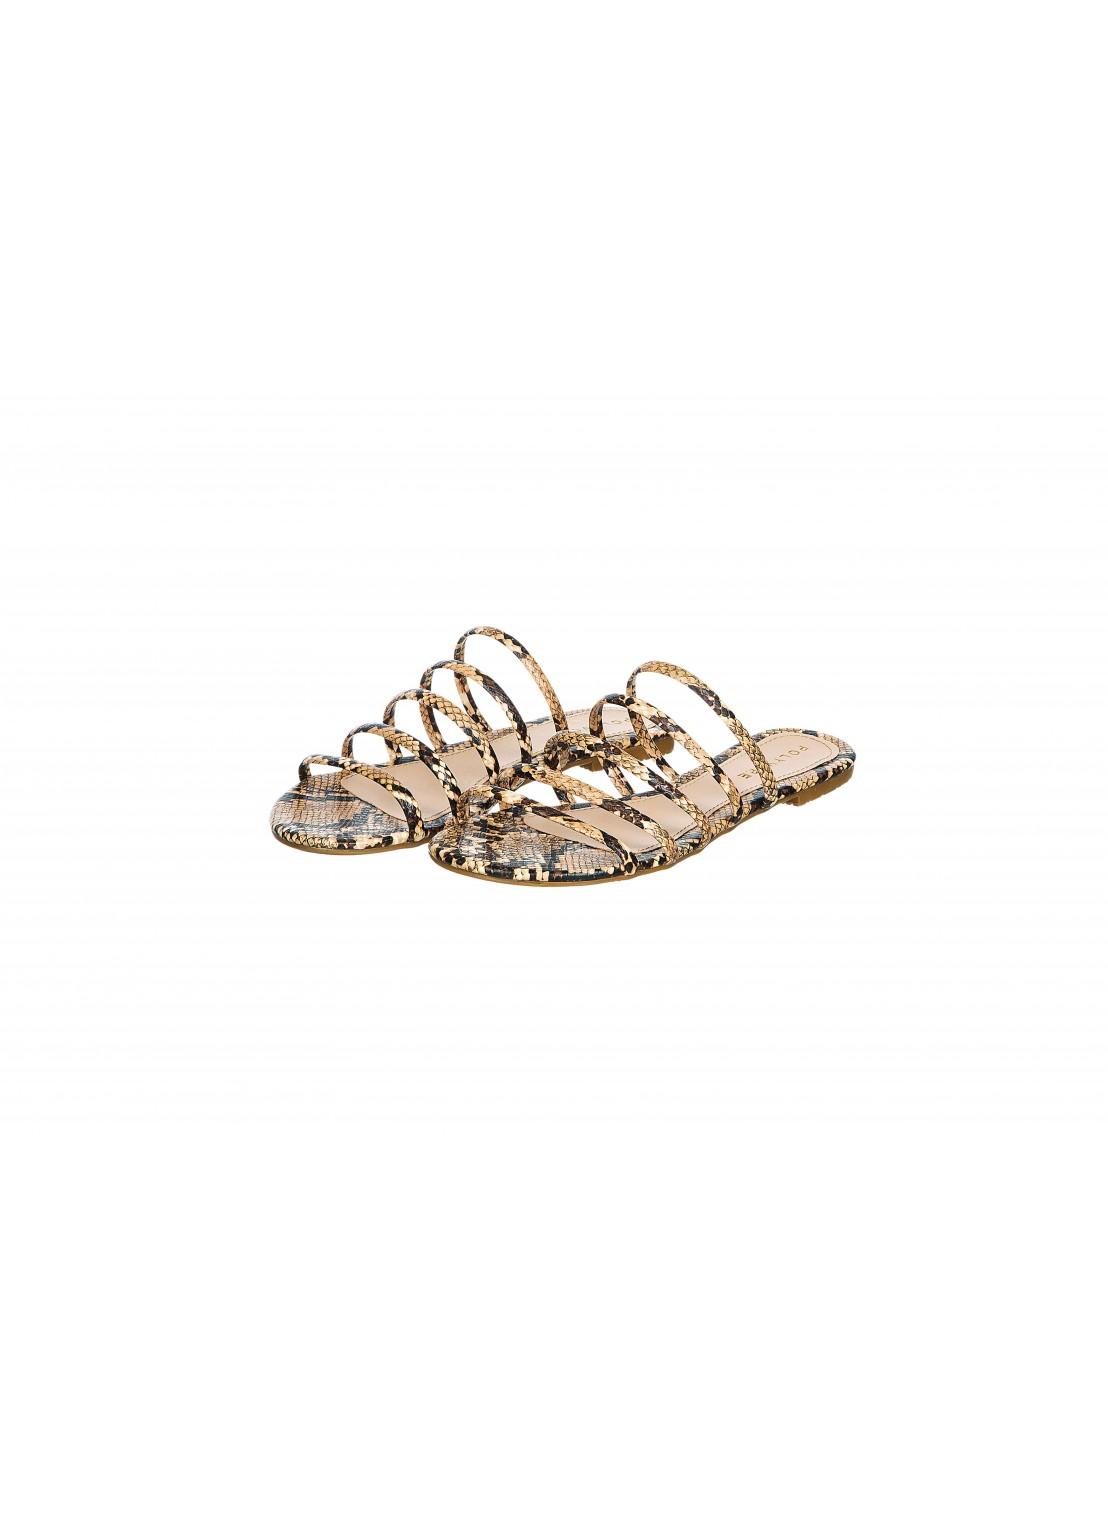 Sandalia piso animal print